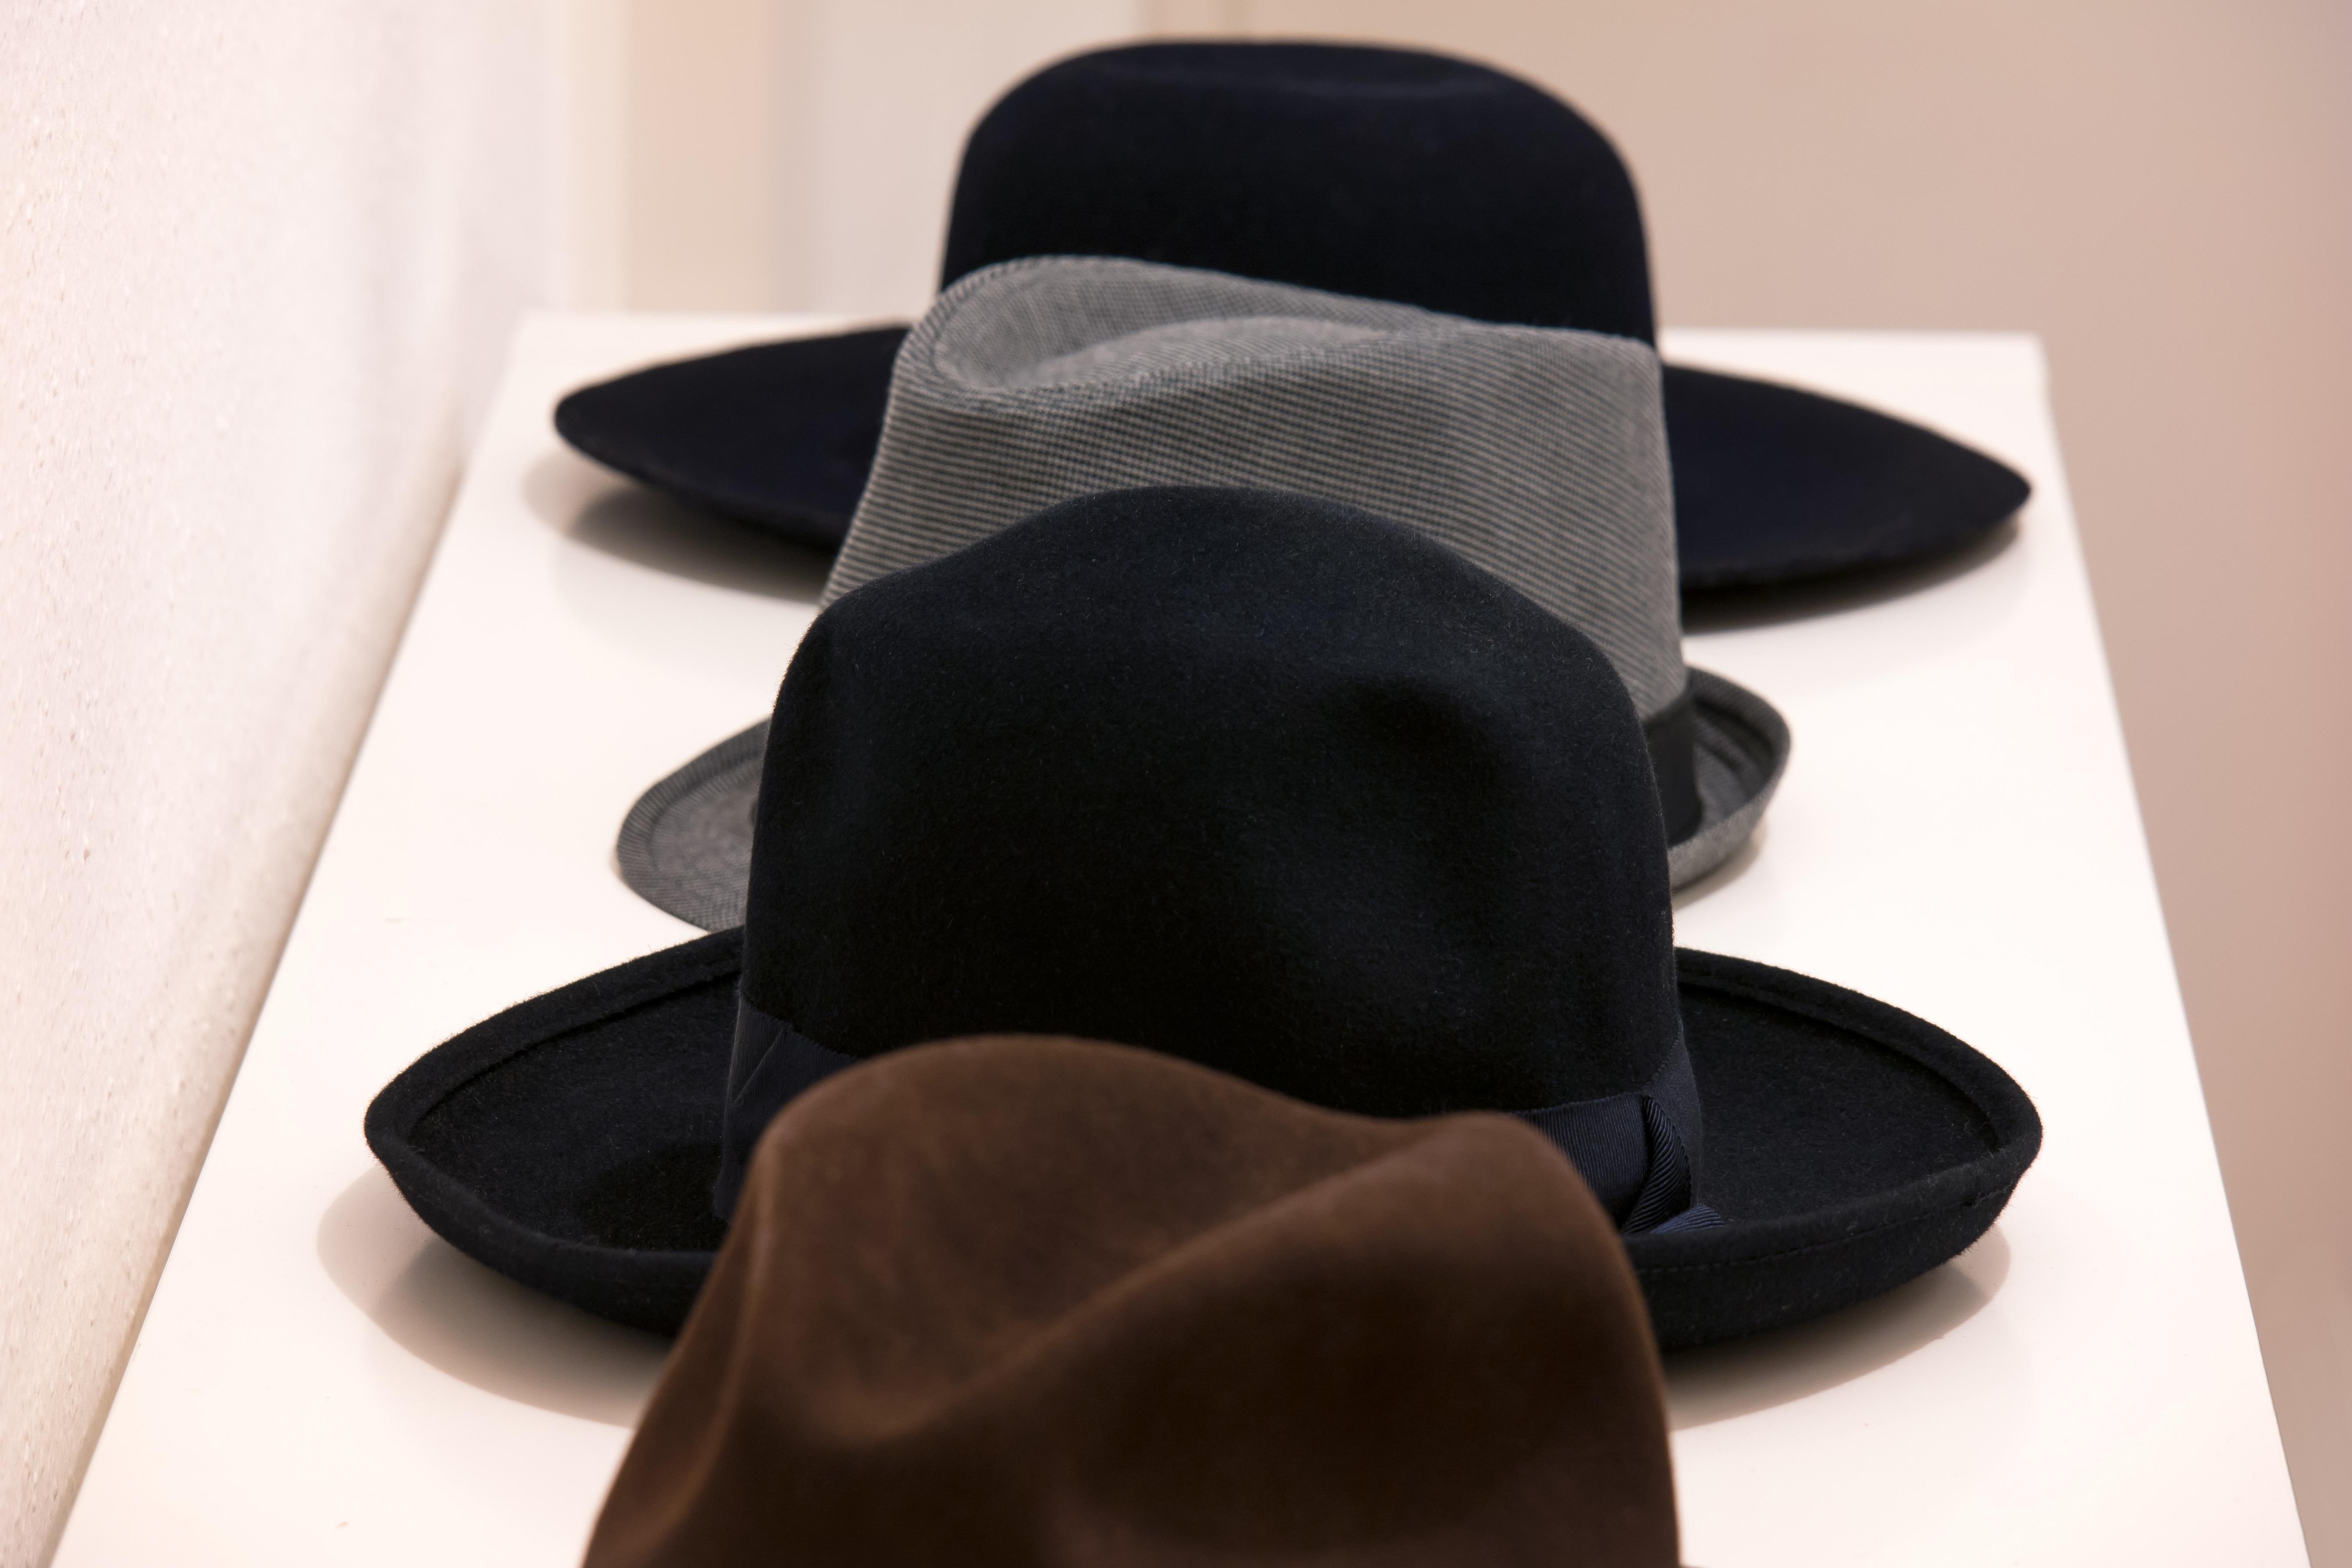 943bd7120 shoe leather leg hat clothing black sandal human body textile footwear  headwear hats fedora felt headdress Public Domain